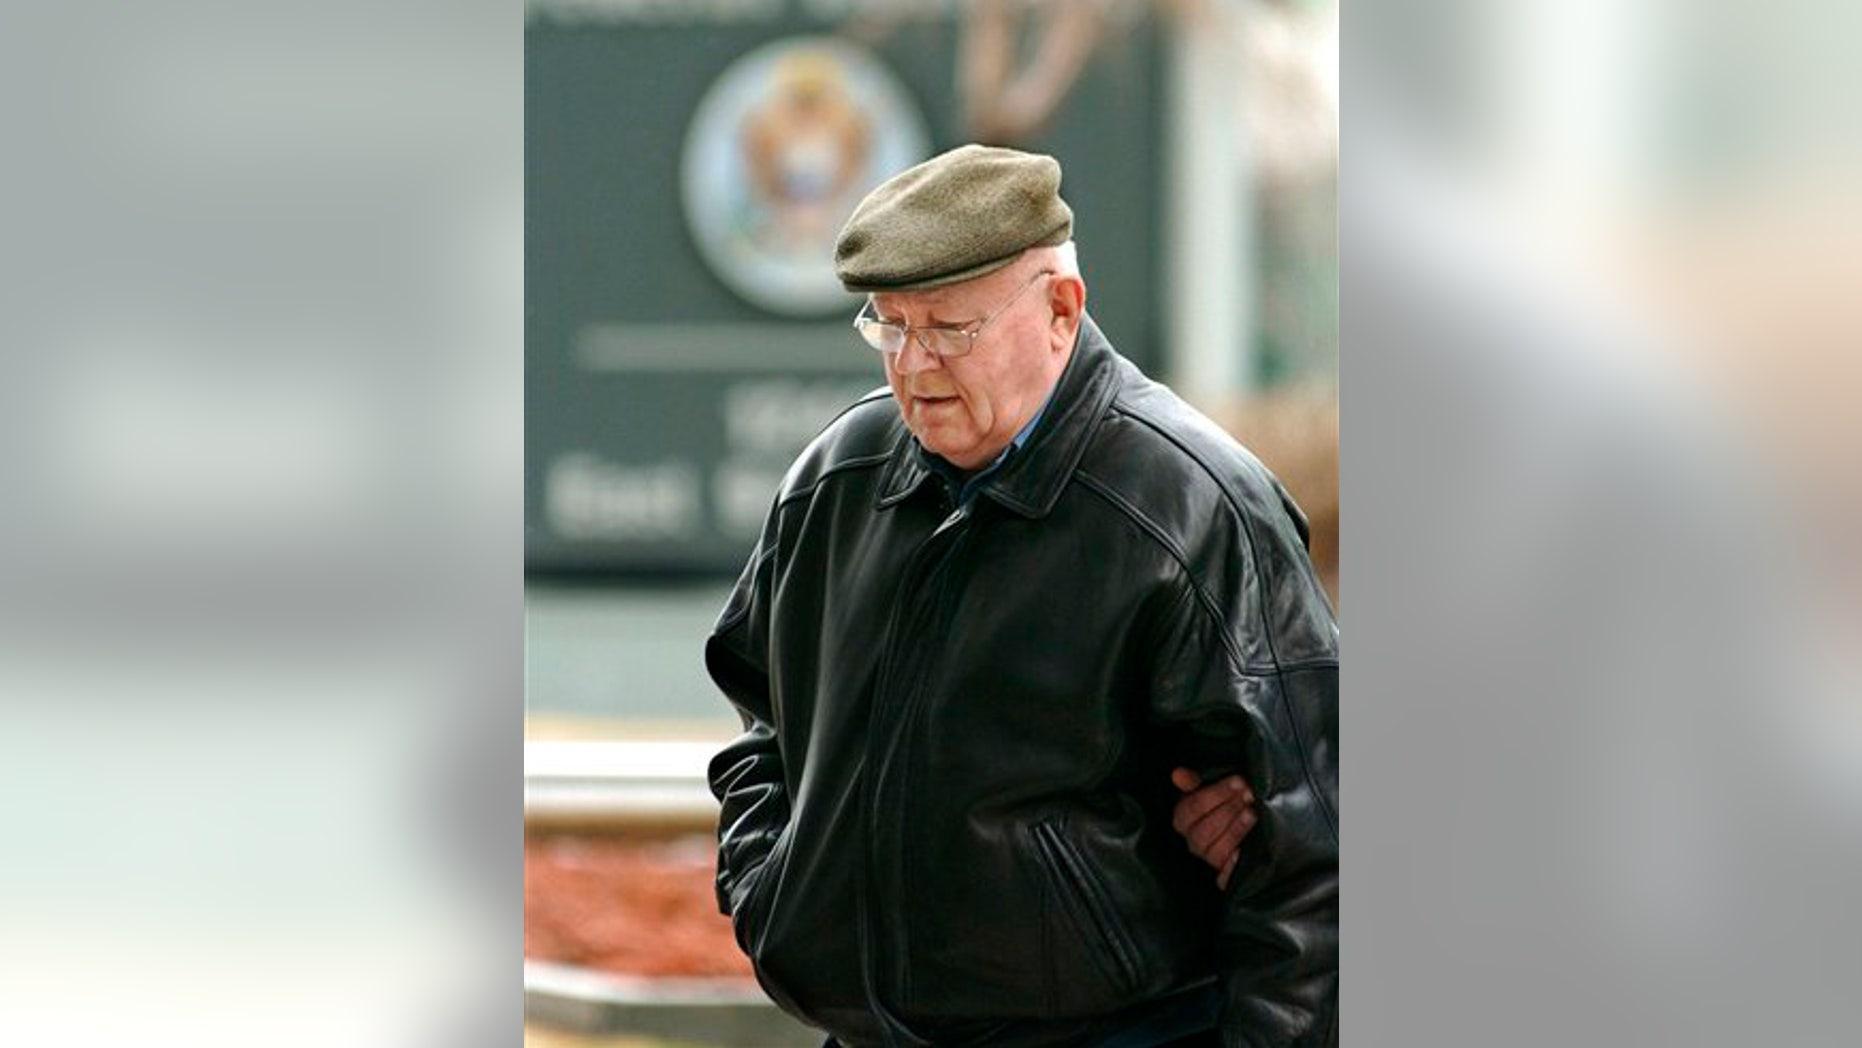 Feb. 28, 2005: Accused Nazi death camp guard John Demjanjuk arrives at the federal building in Cleveland.